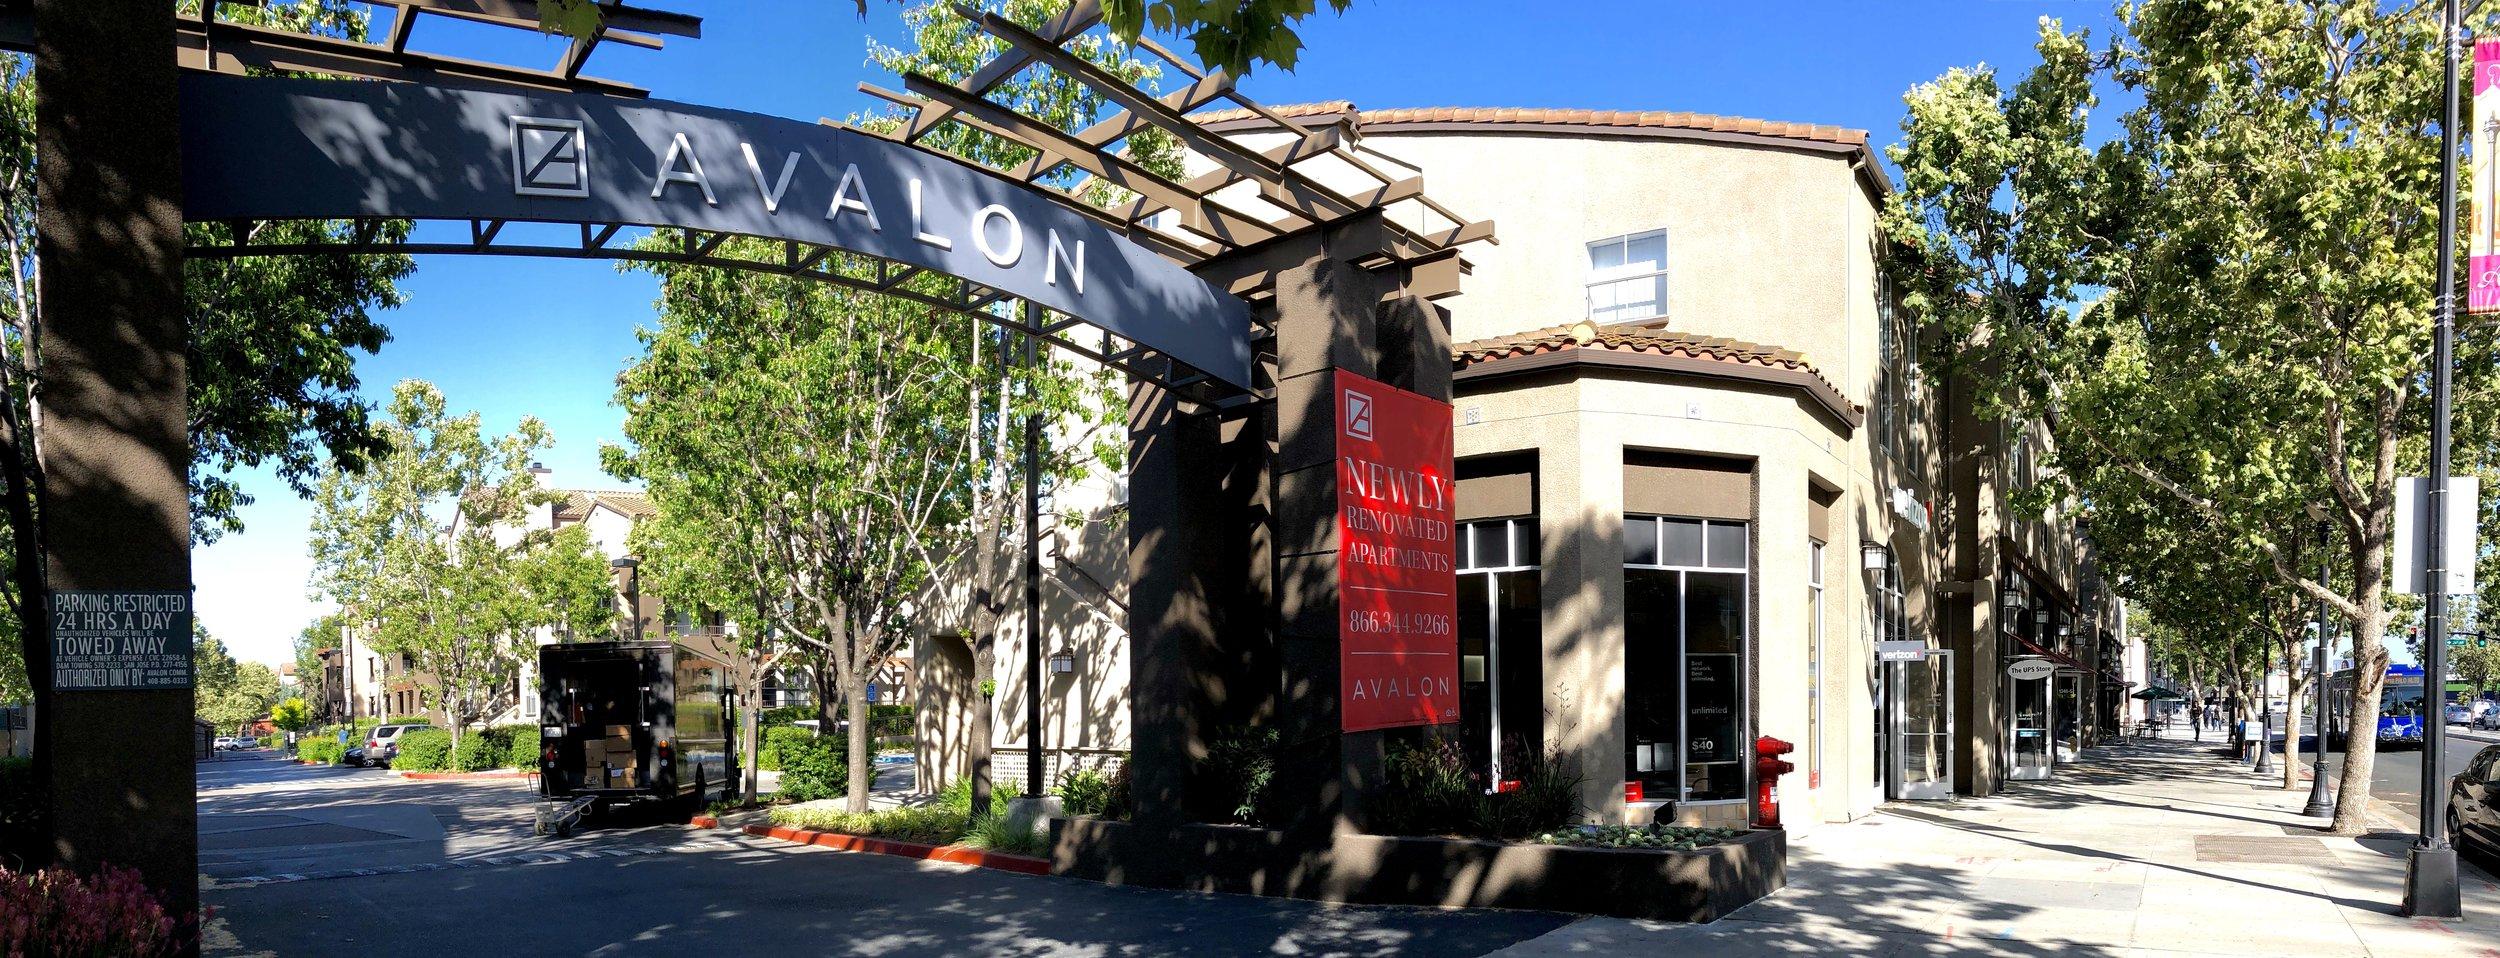 Blog Page - Avalon MU on The Alameda San Jose 2018 copy.jpg